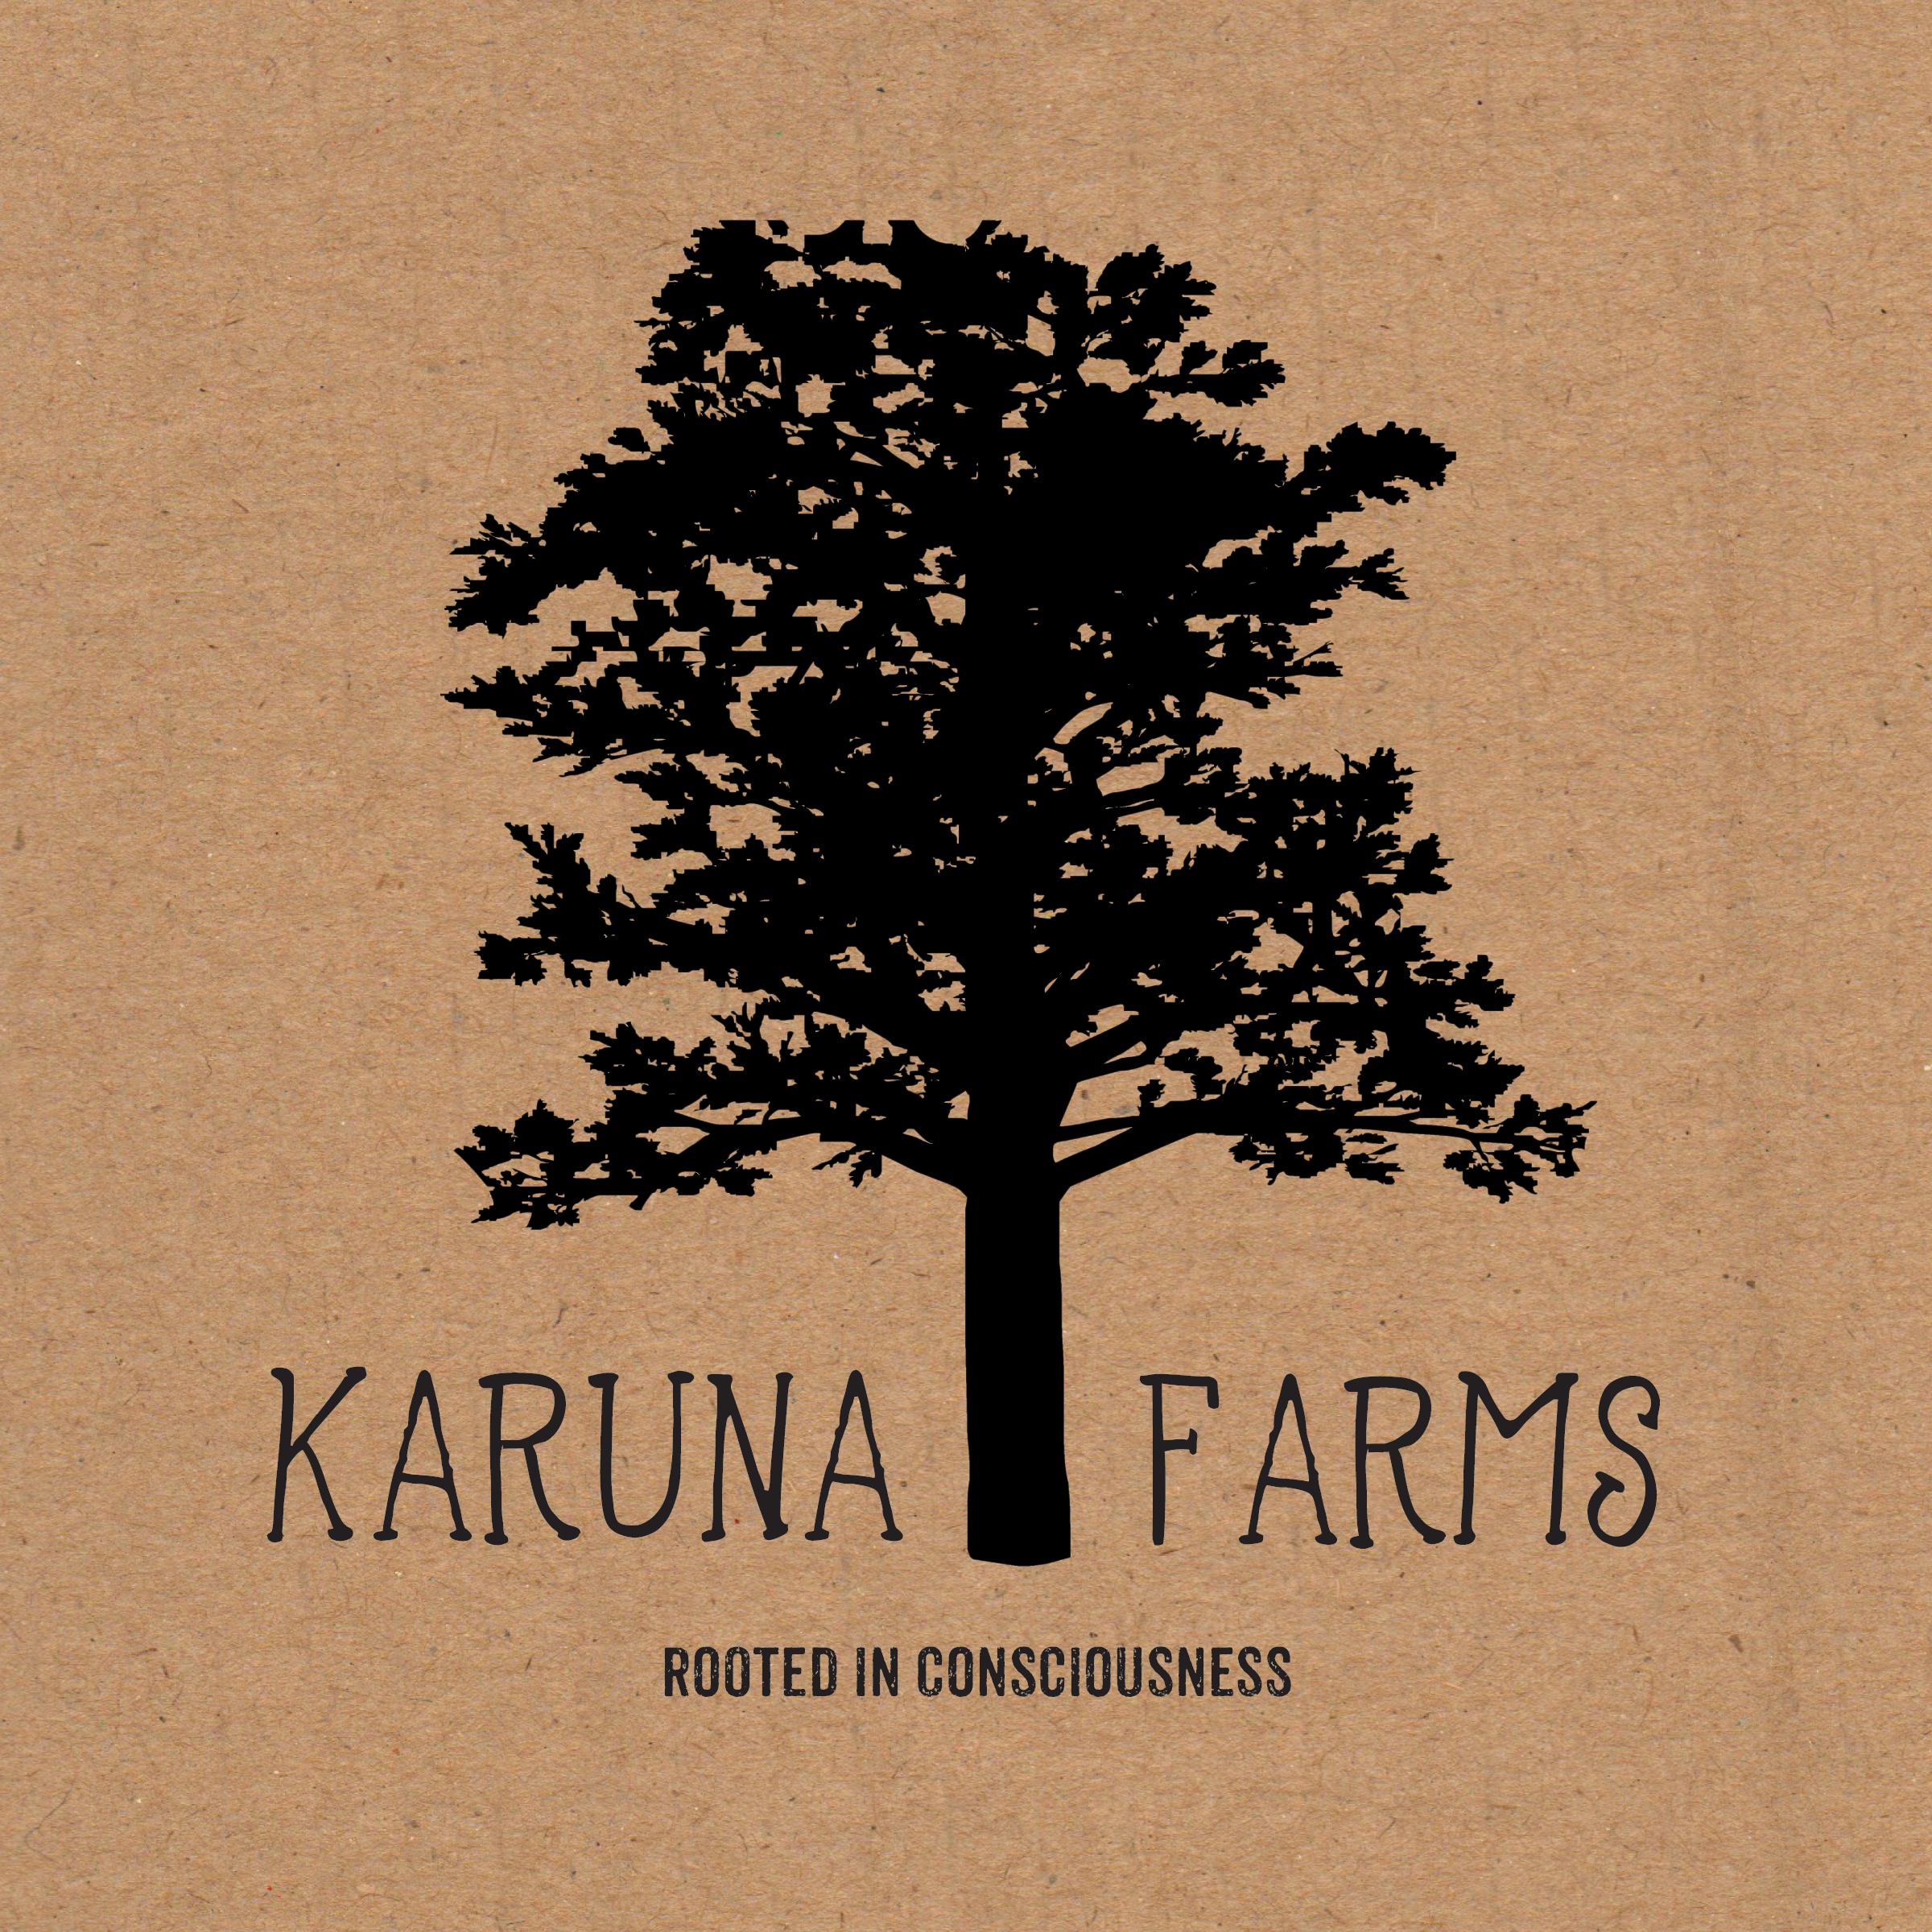 Karuna-Farms-Logo-2-8.png